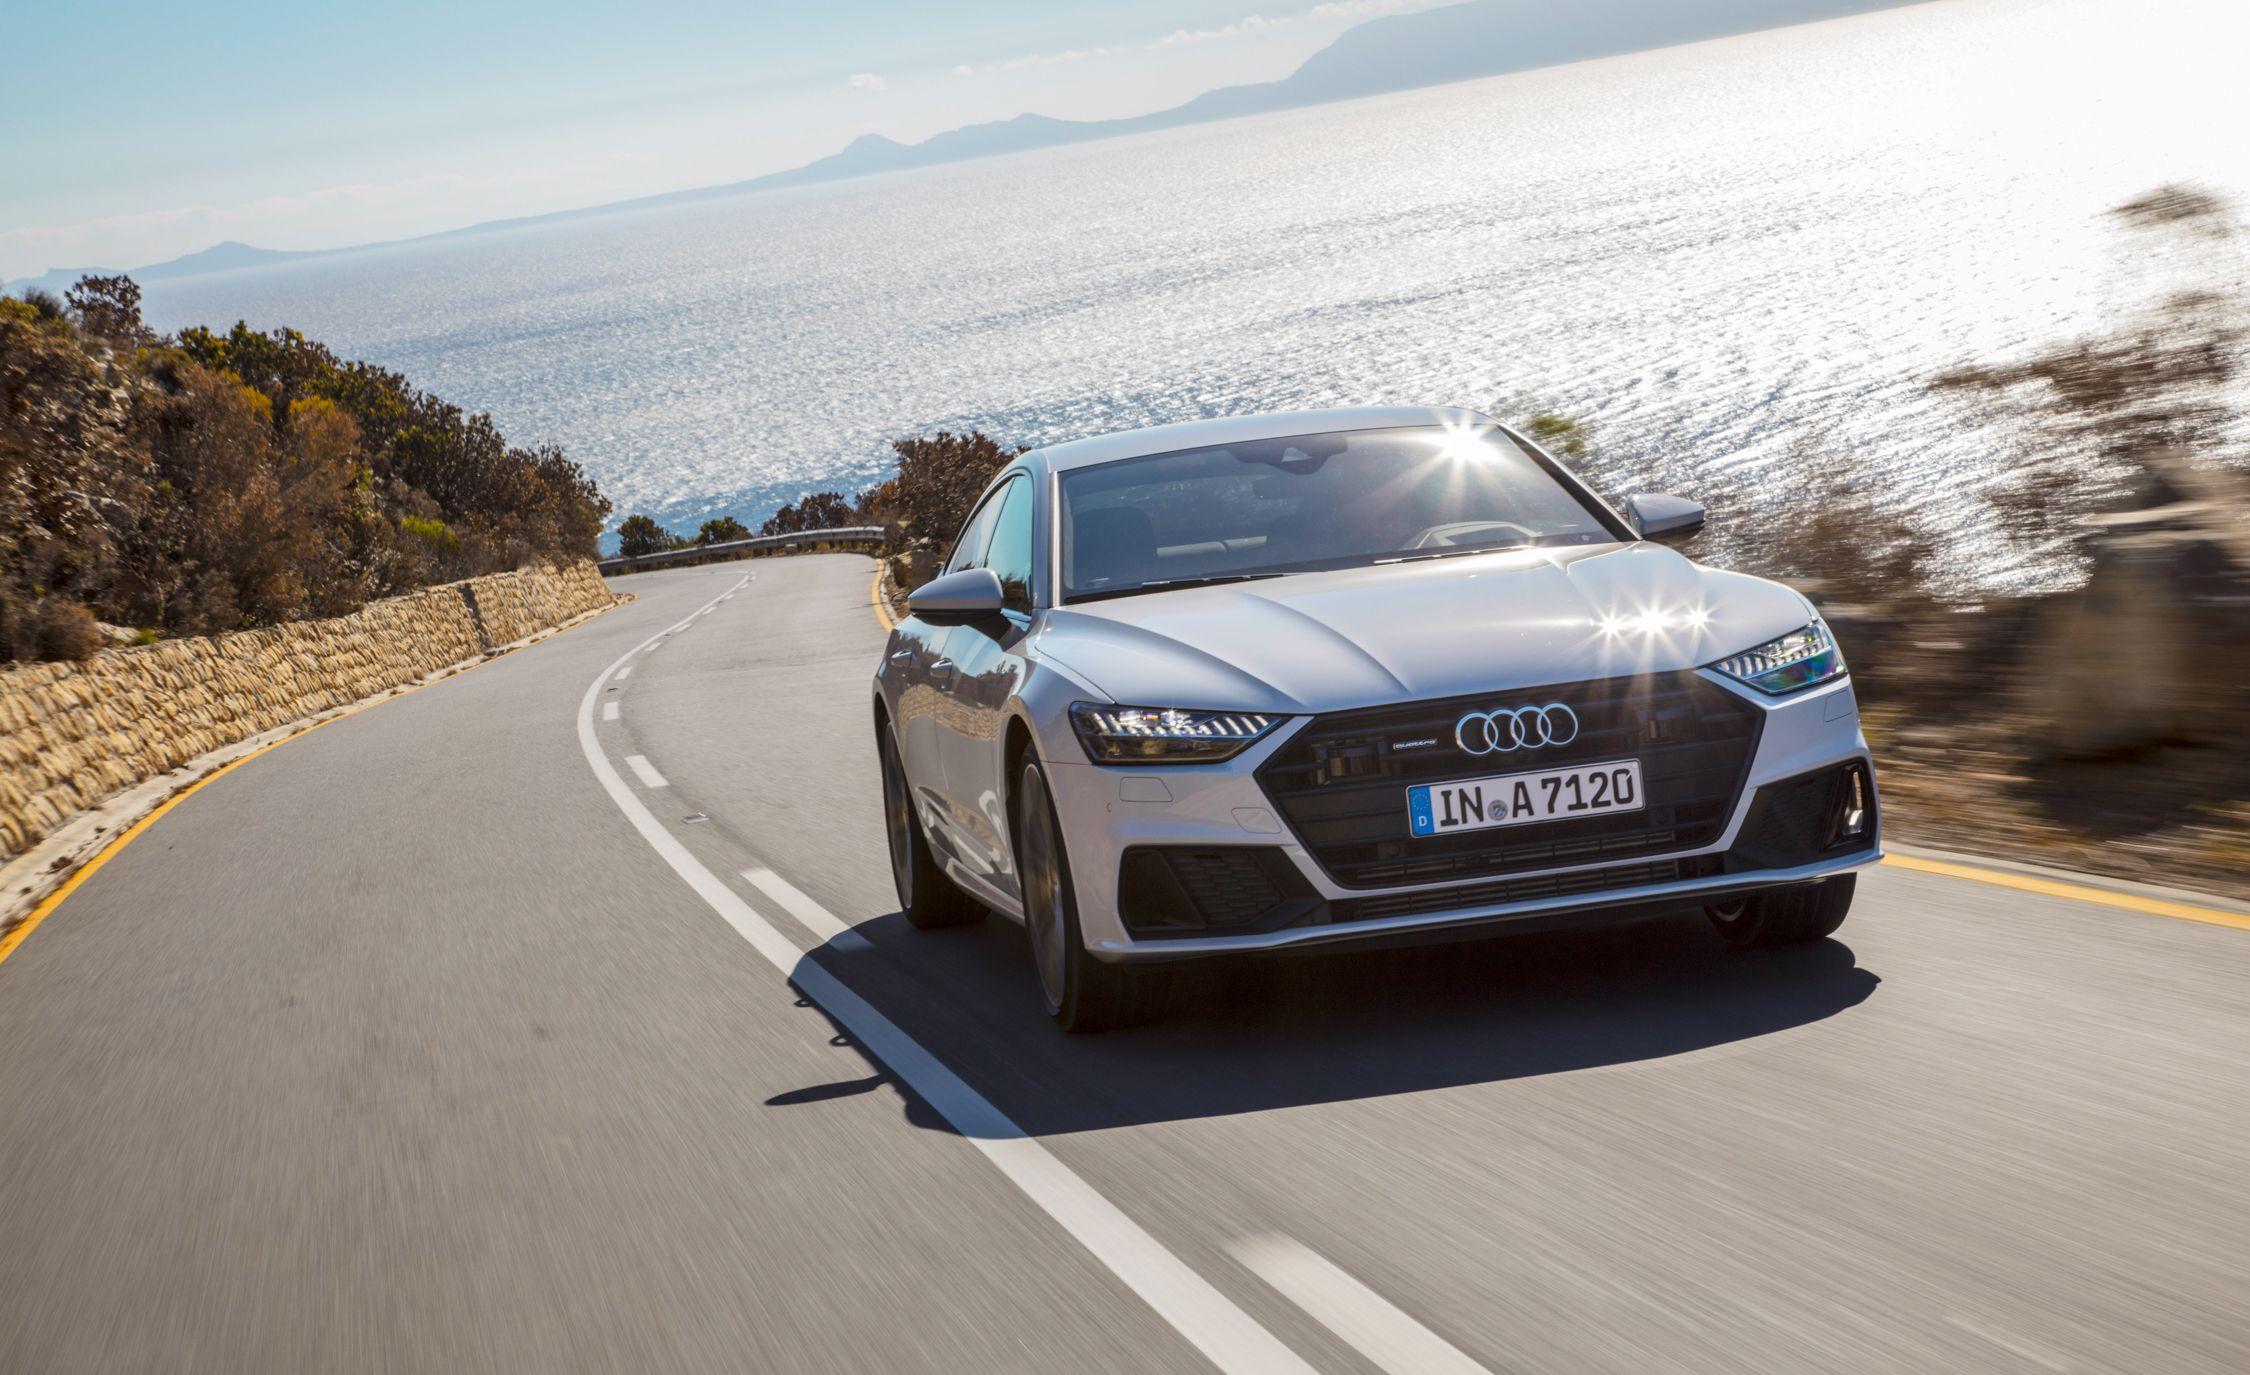 2019-Audi-A7-Sportback-186-1.jpg